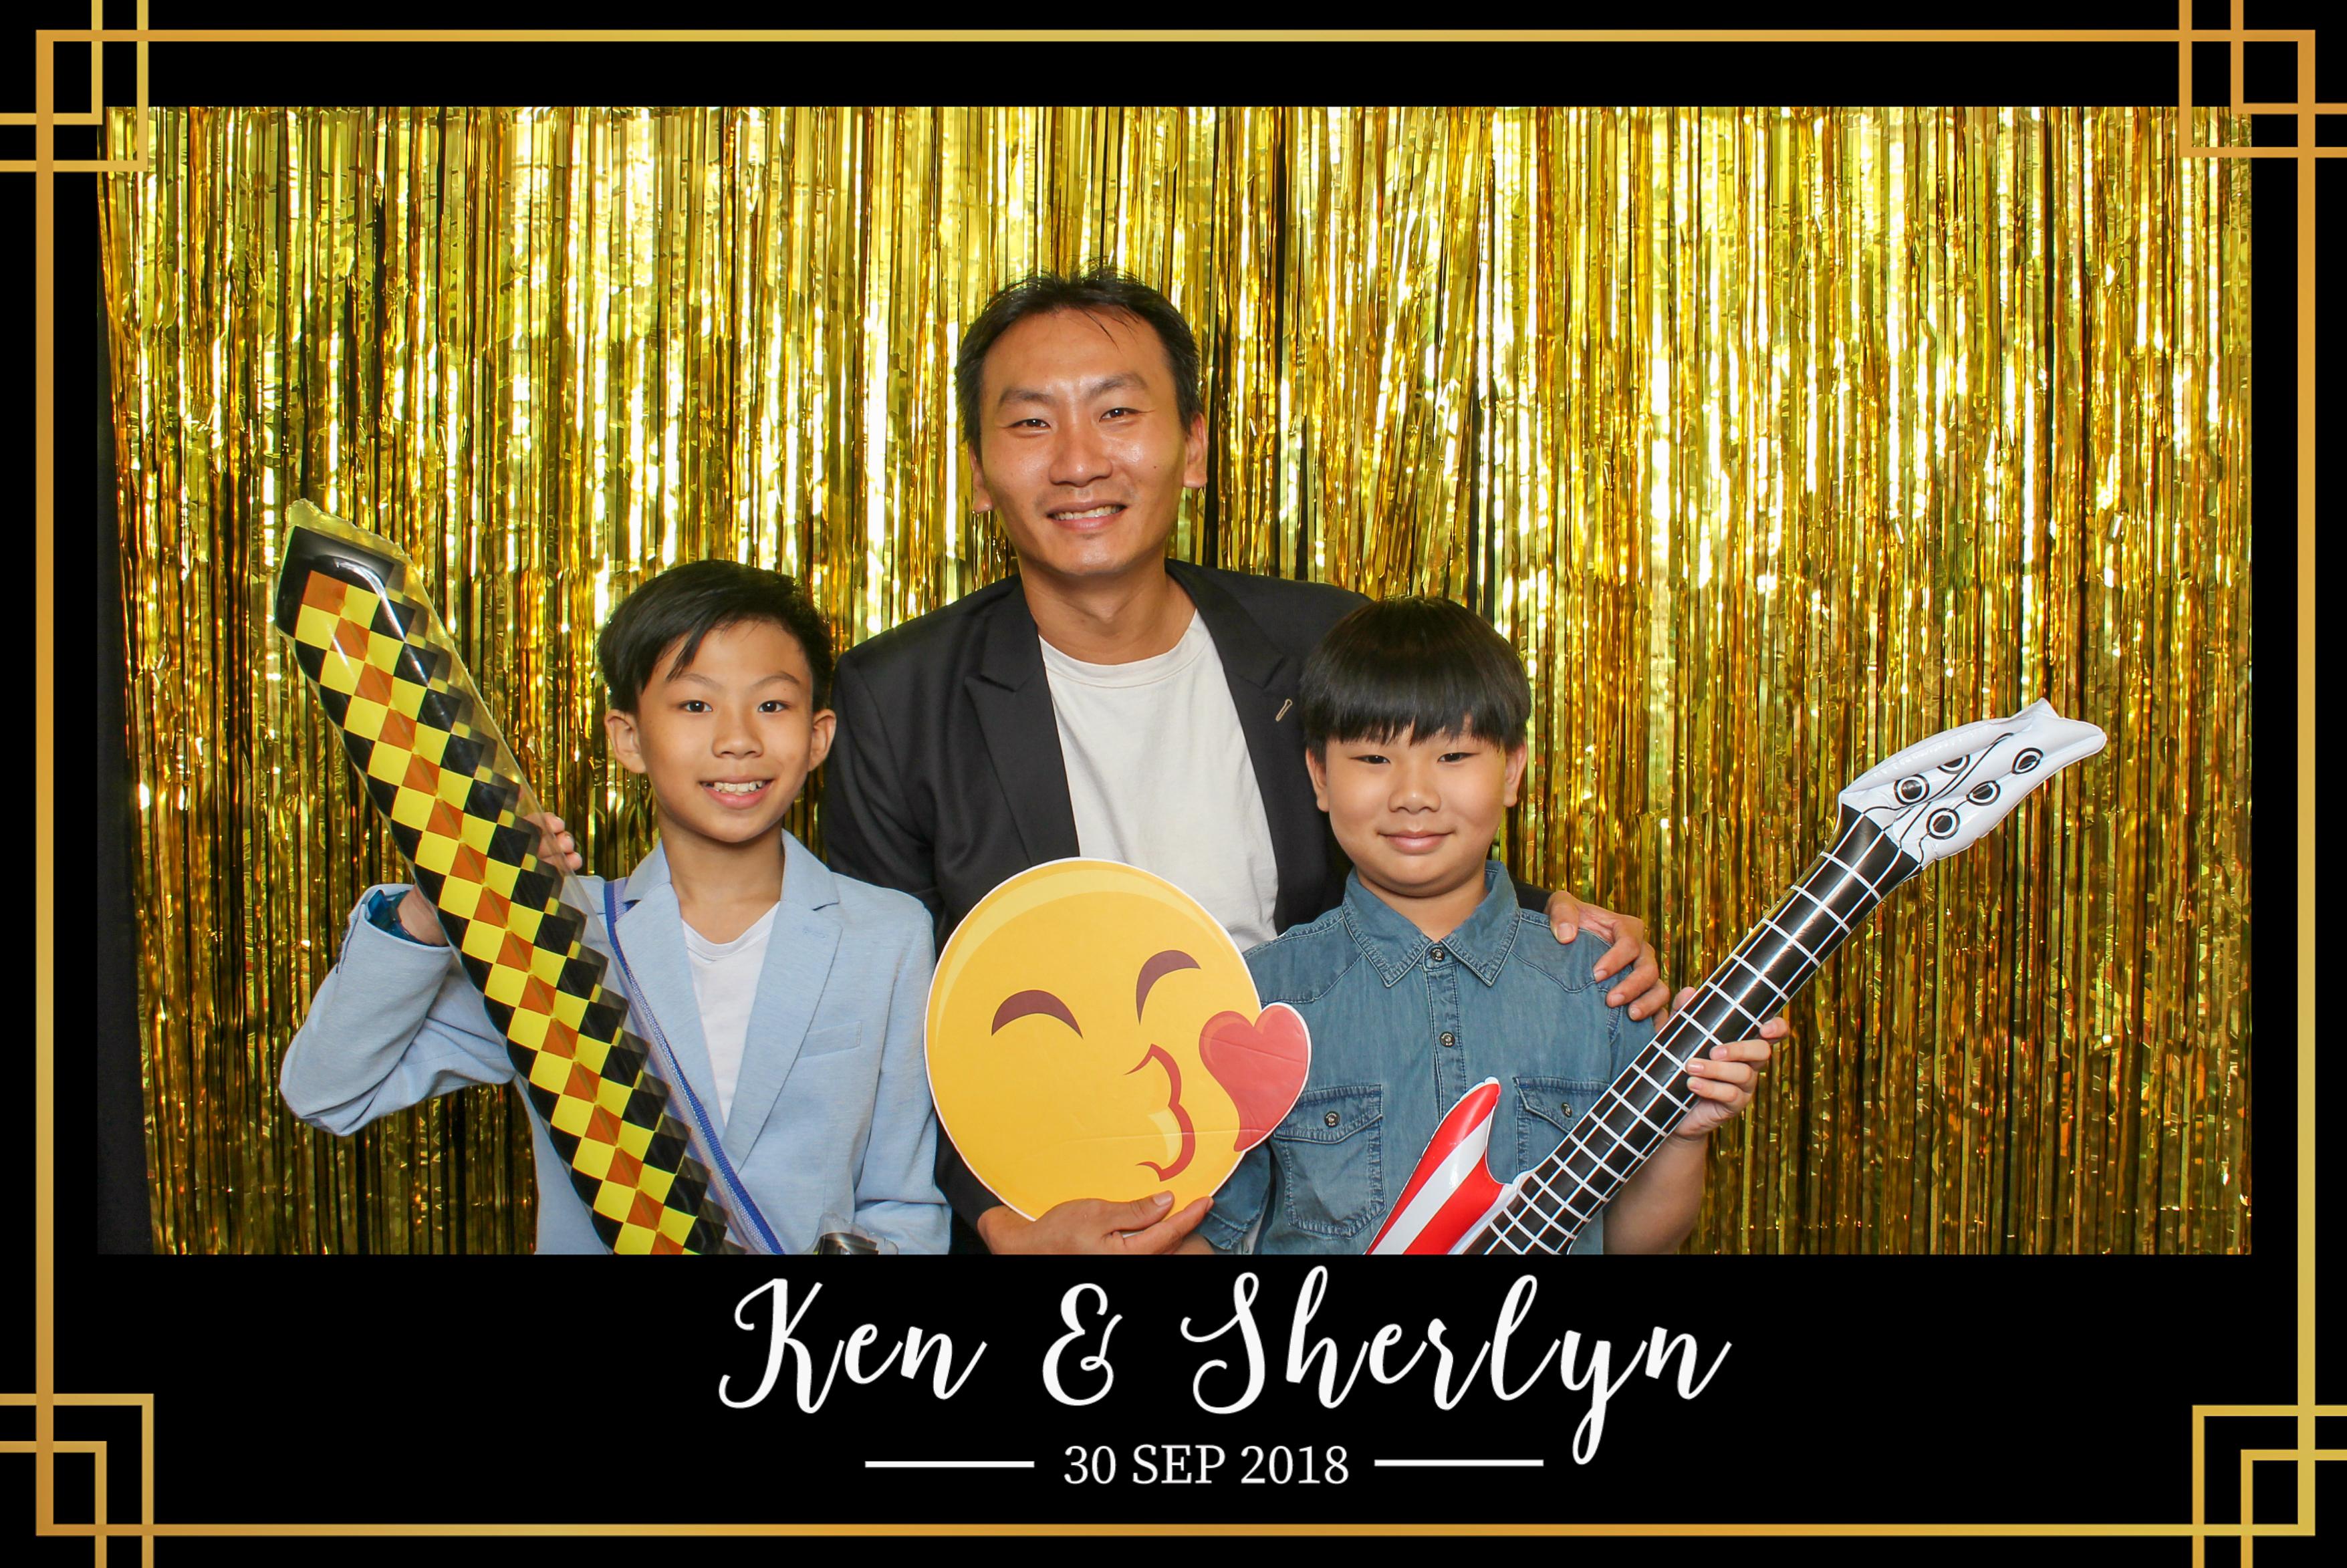 Ken Sherlyn wedding photo booth (4)